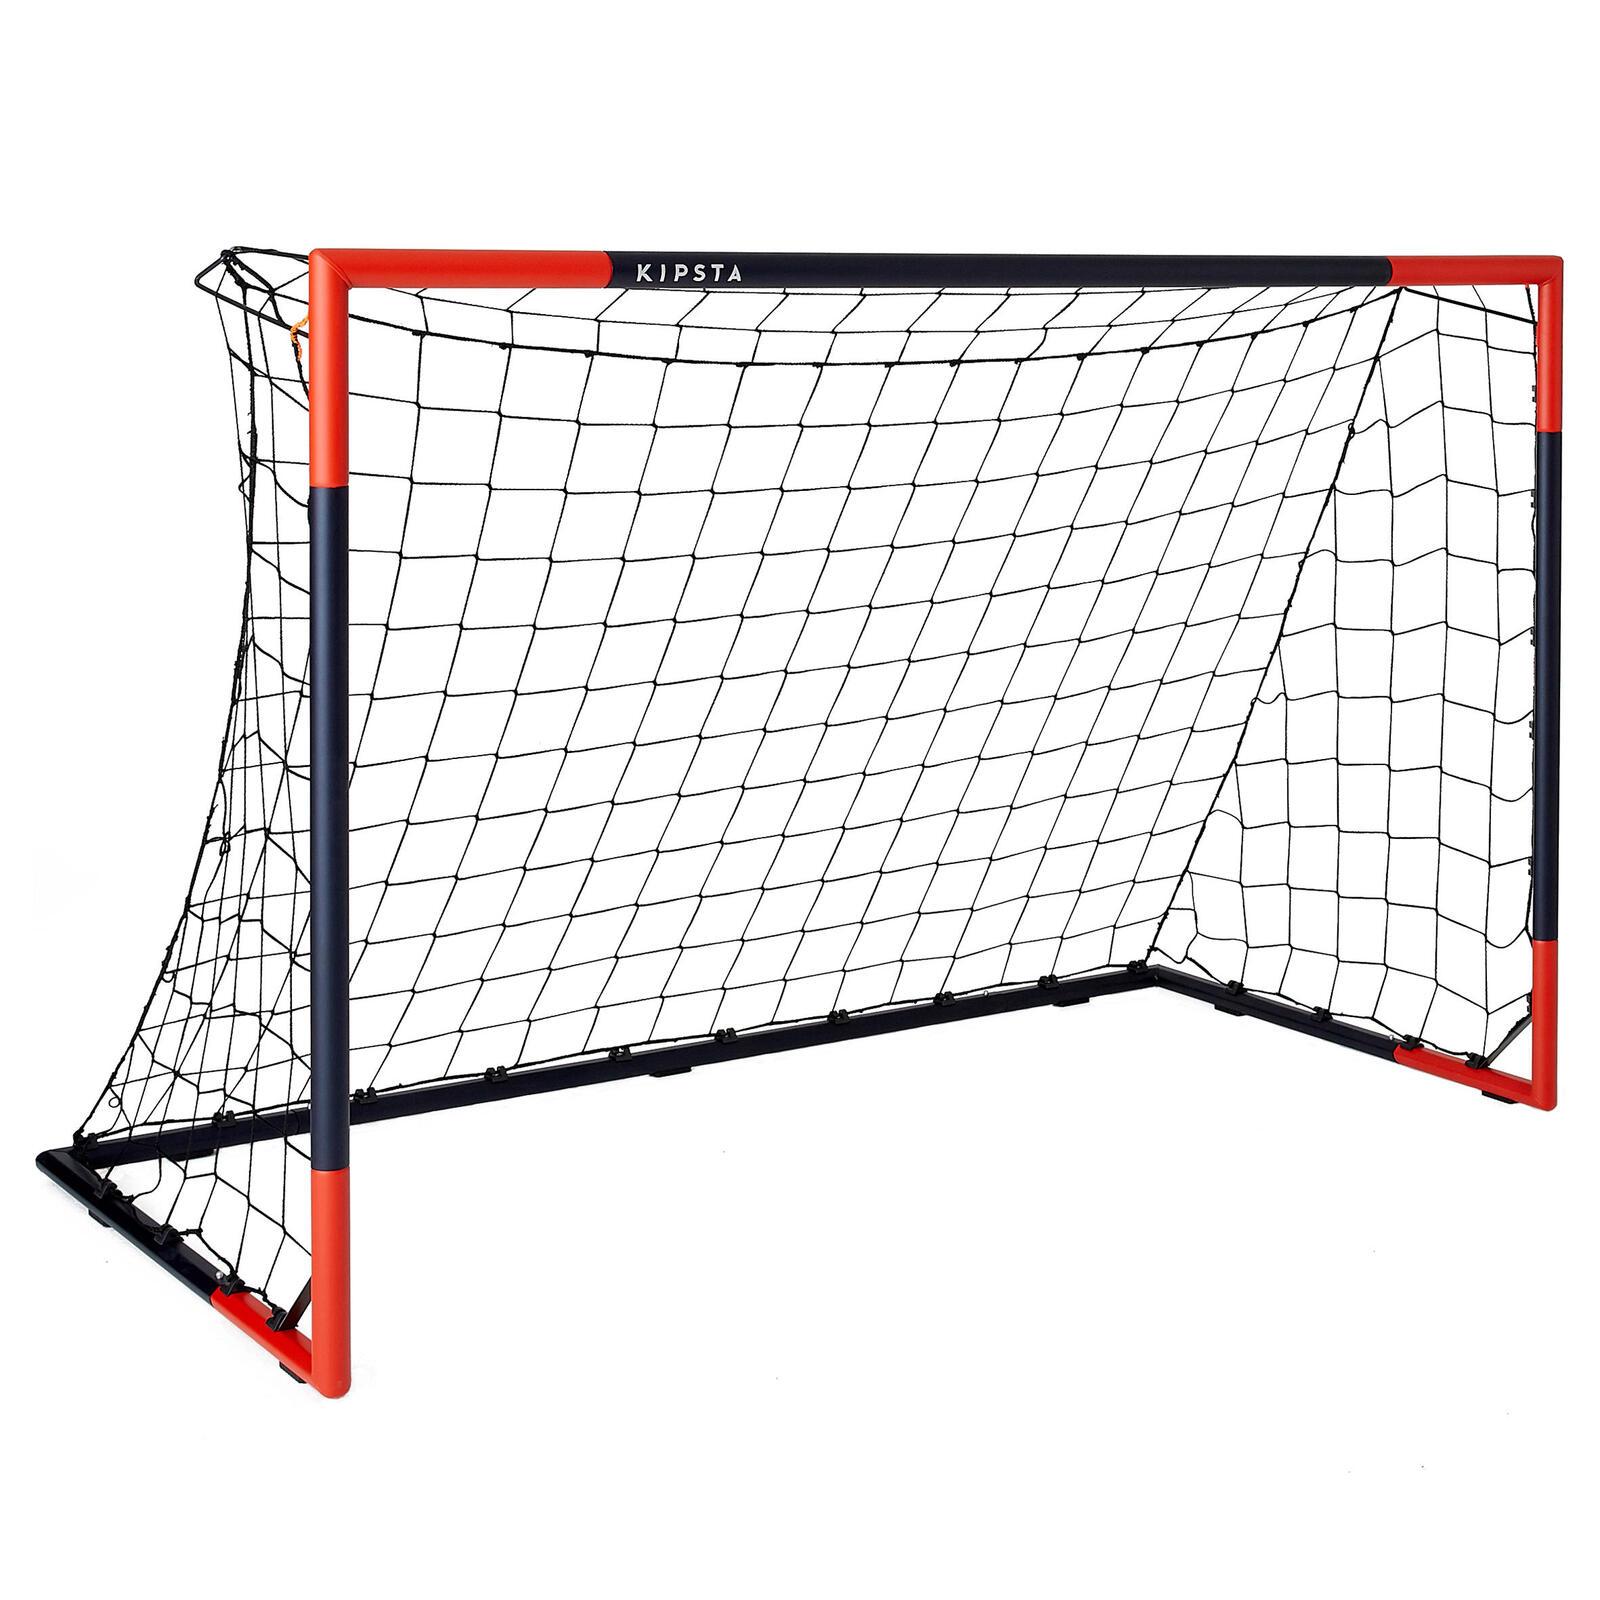 Football goal SG 500 size M